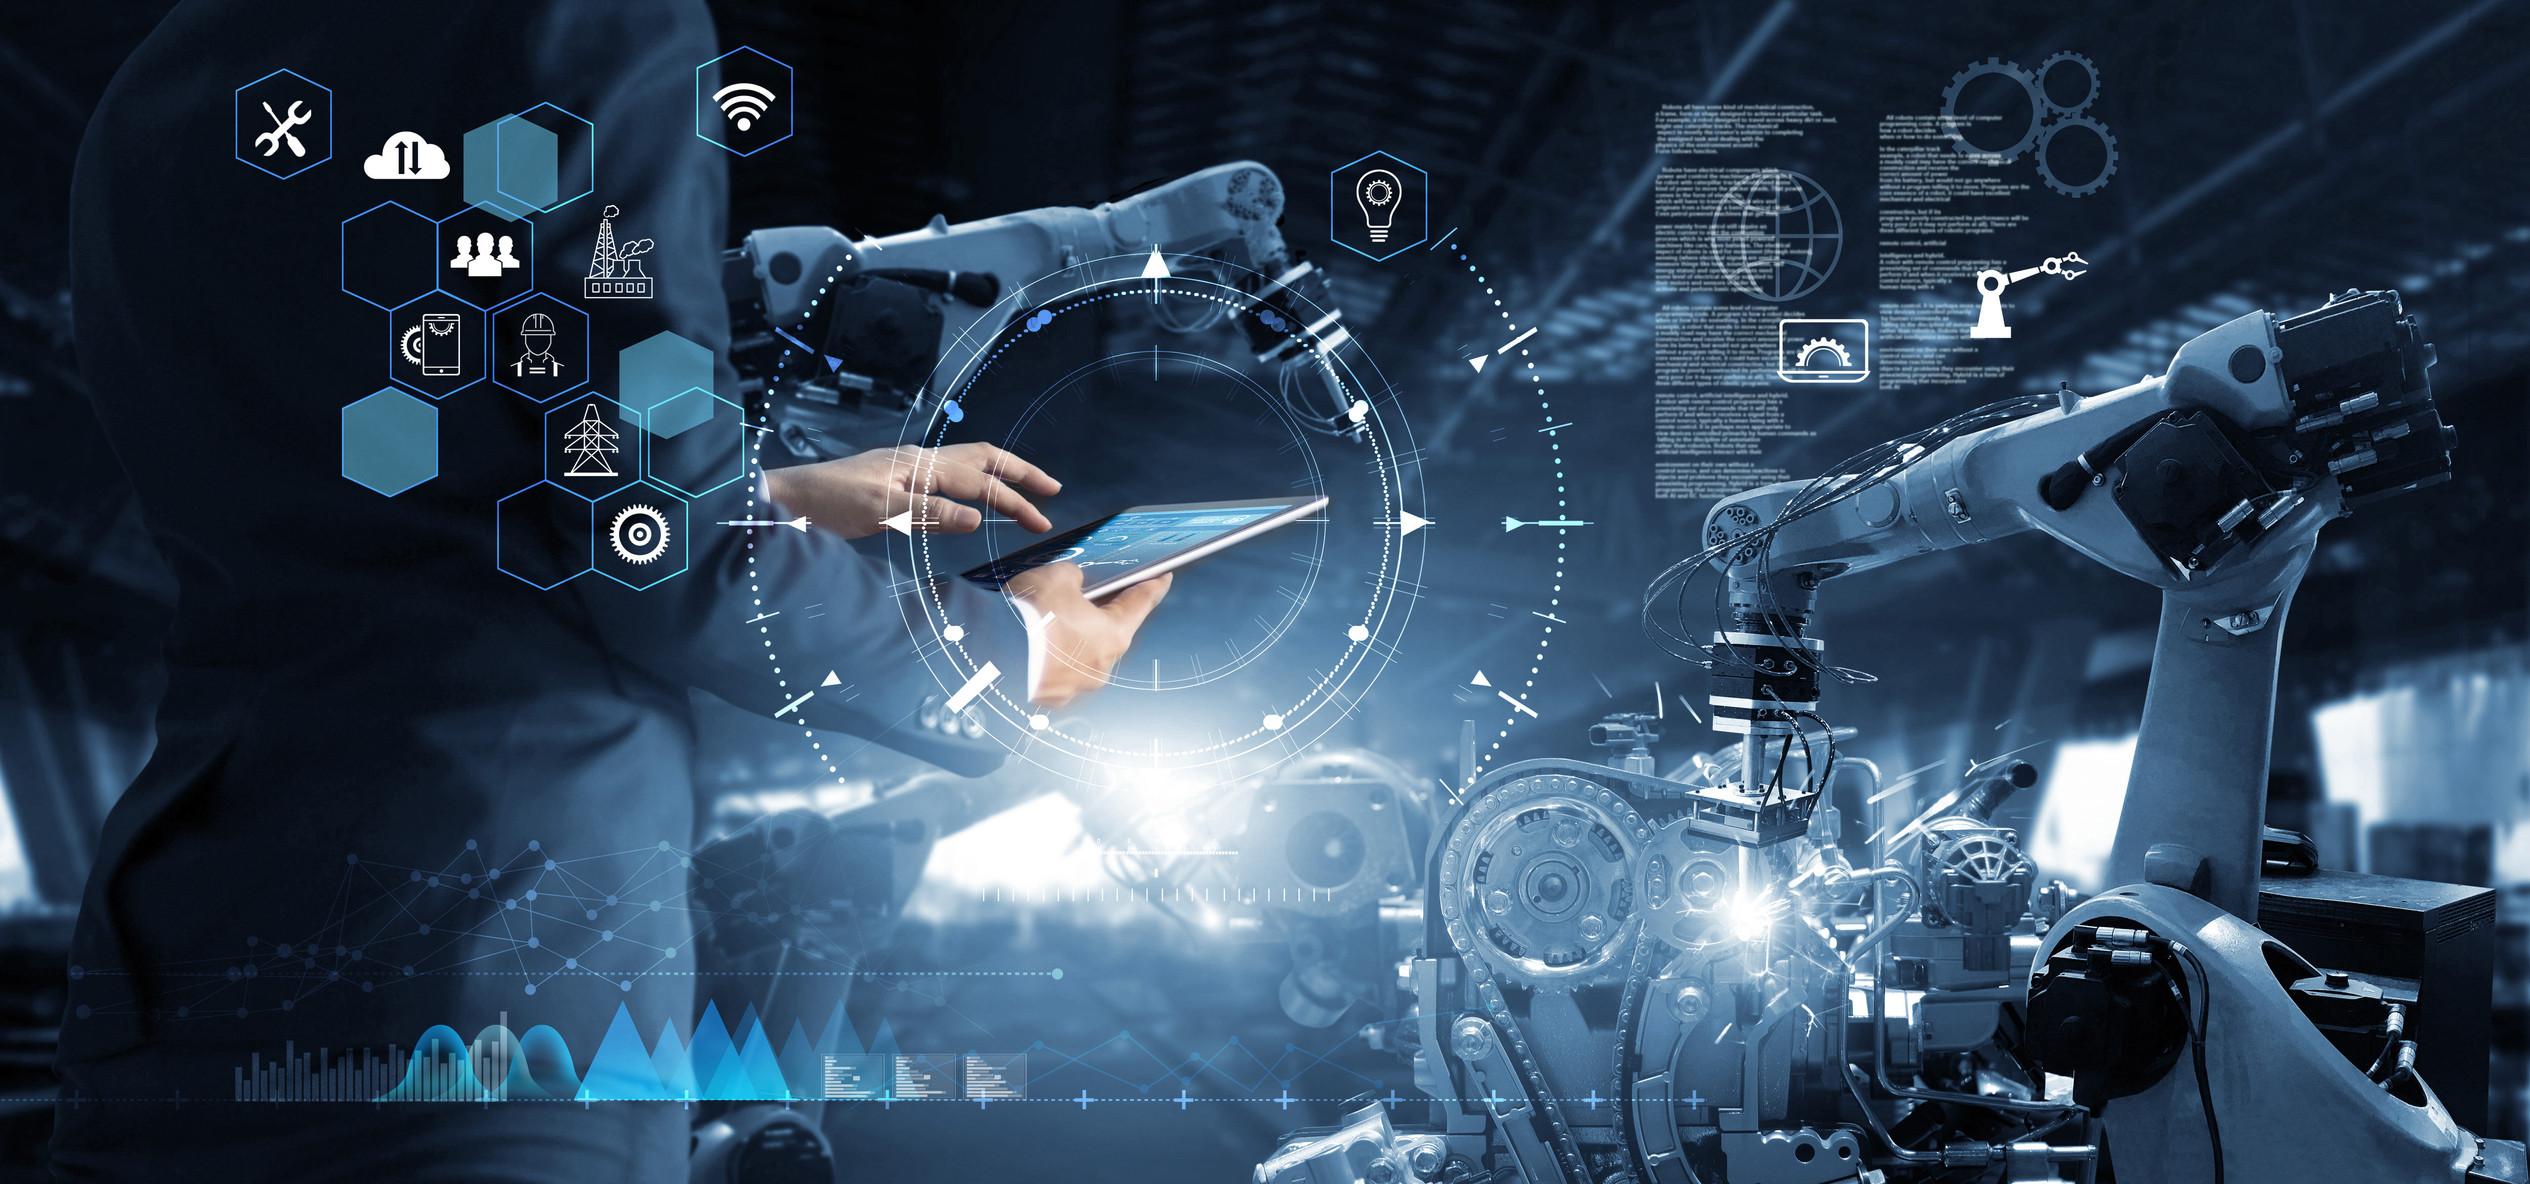 Future shocks: 17 technology predictions for 2025 | World Economic Forum